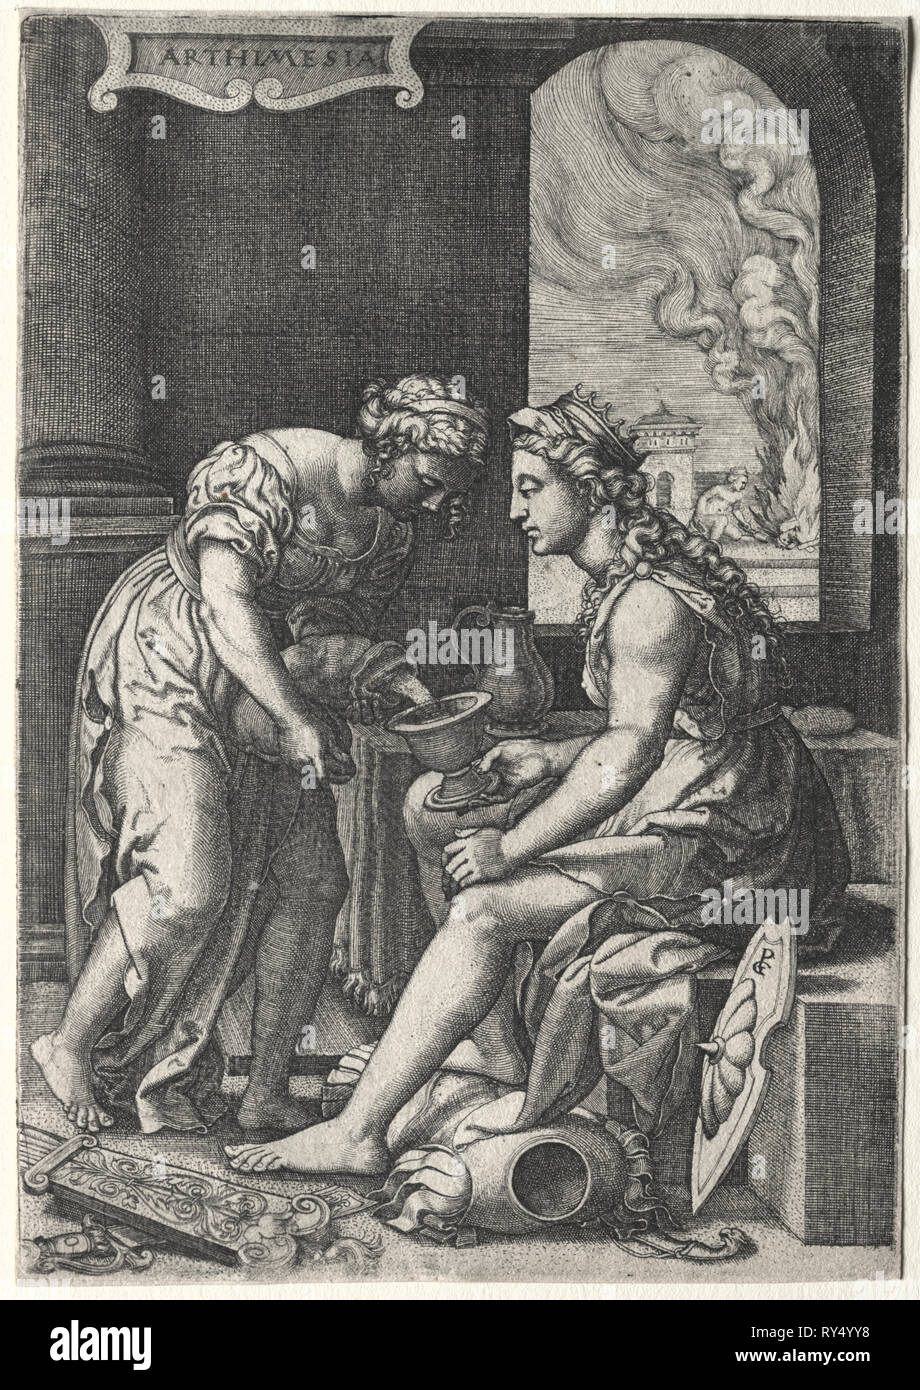 Artemisia, c. 1539. Georg Pencz (German, c. 1500-1550). Engraving - Stock Image